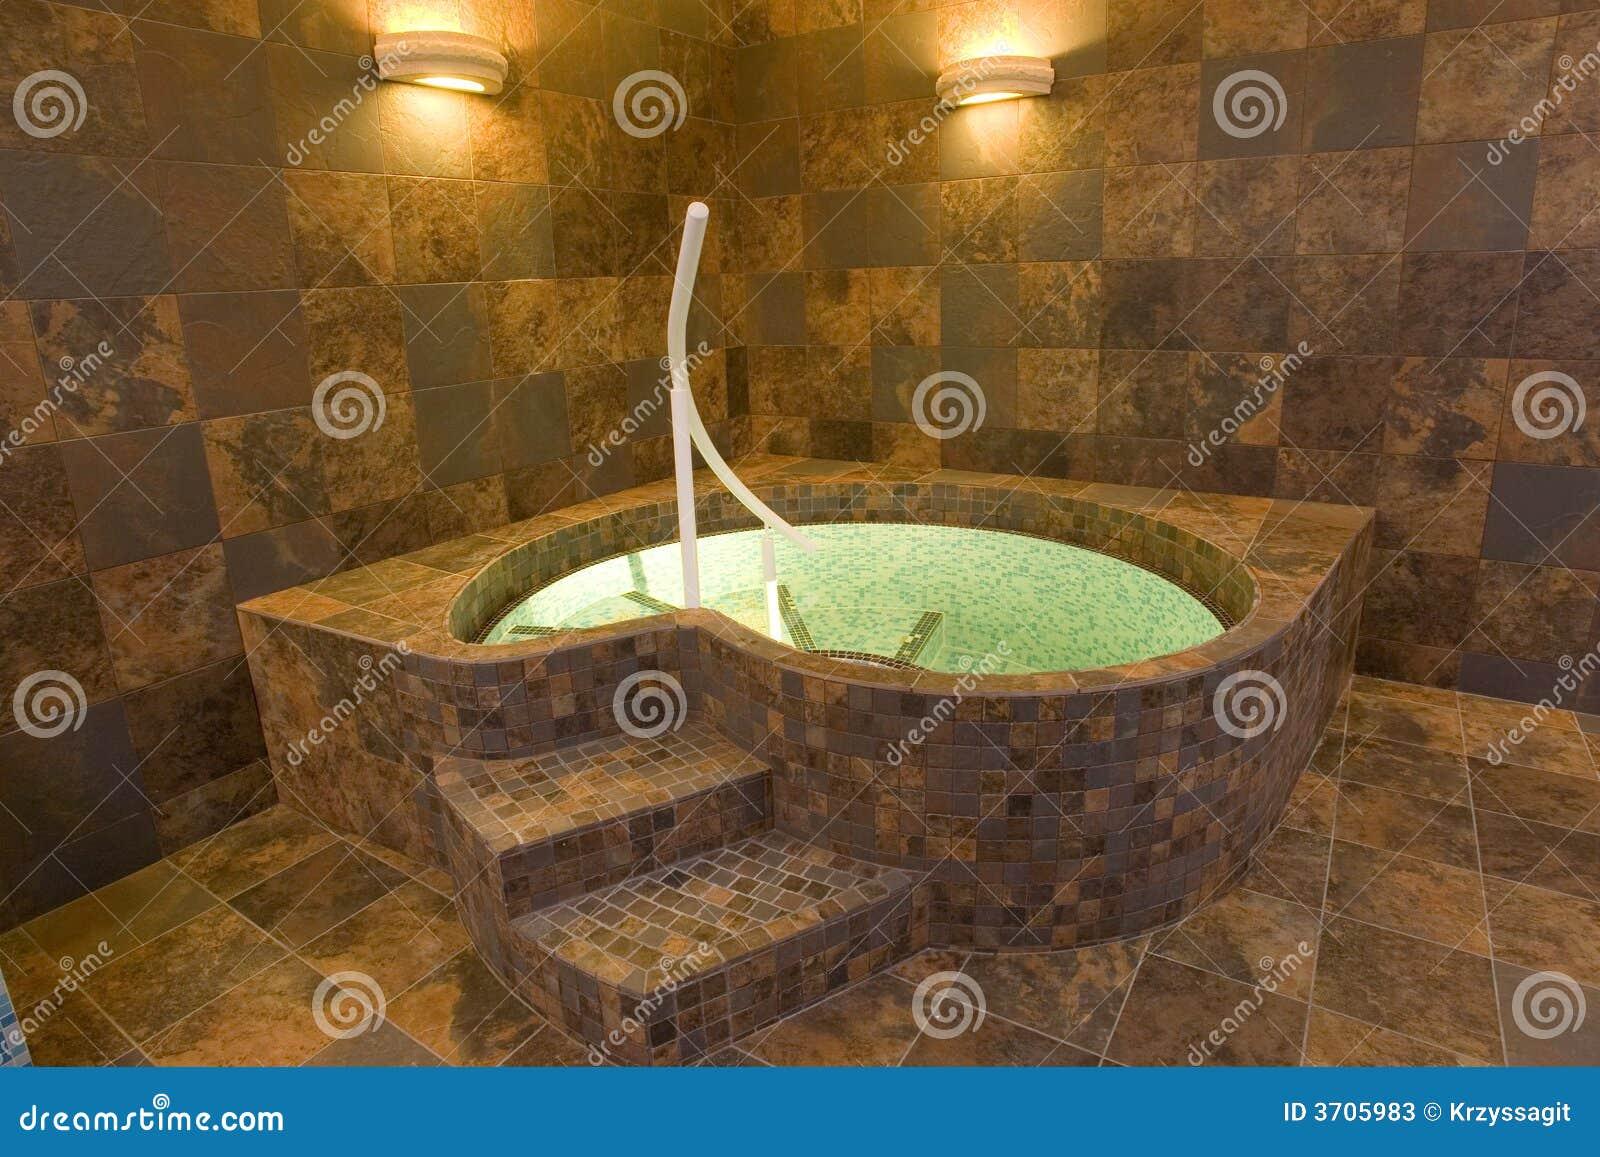 Charming Indoor Swimming Pool Architecture #3: Indoor-jacuzzi-pool-3705983.jpg